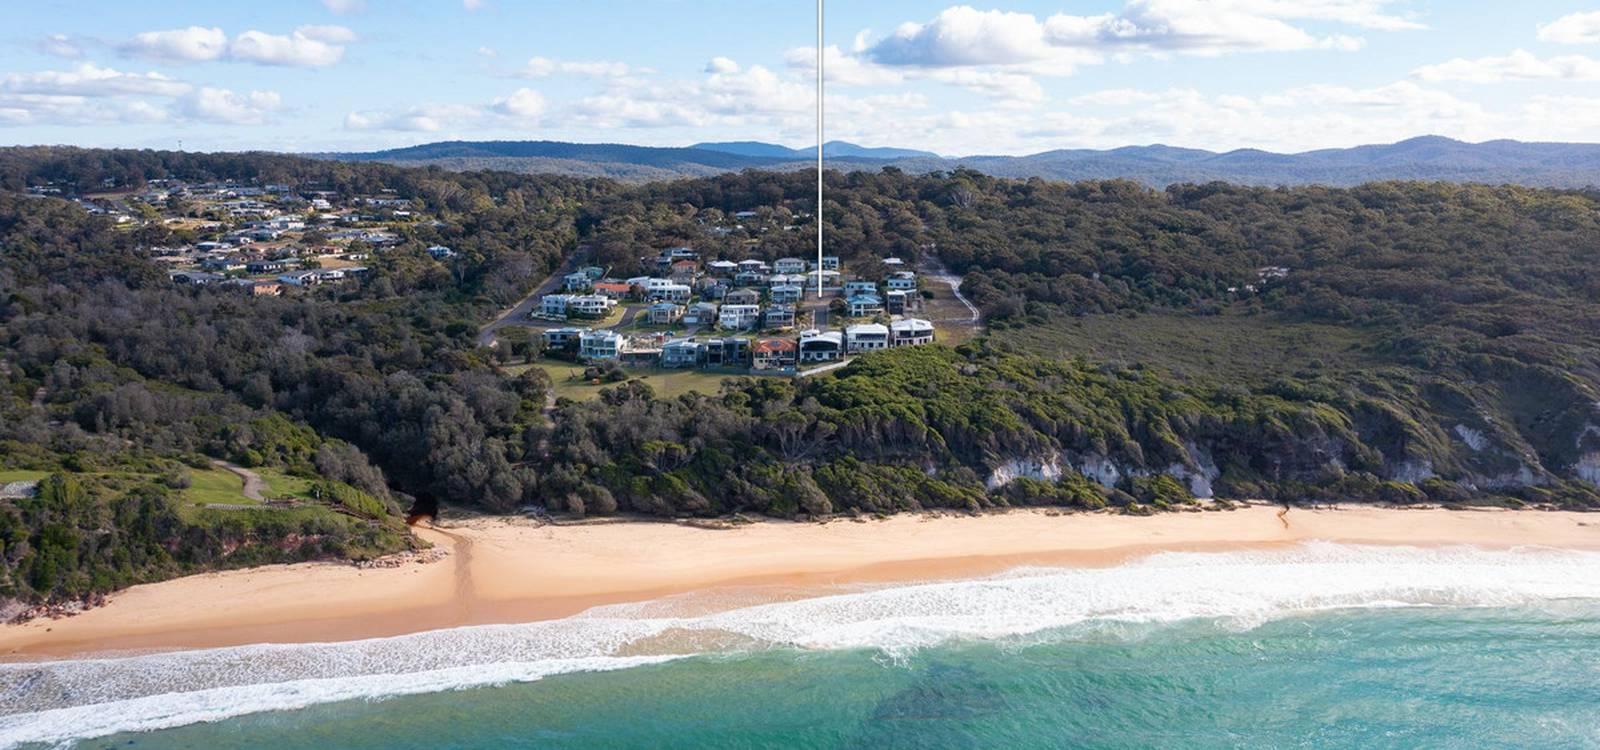 7 Nichole Court TURA BEACH, NSW 2548 - photo 1